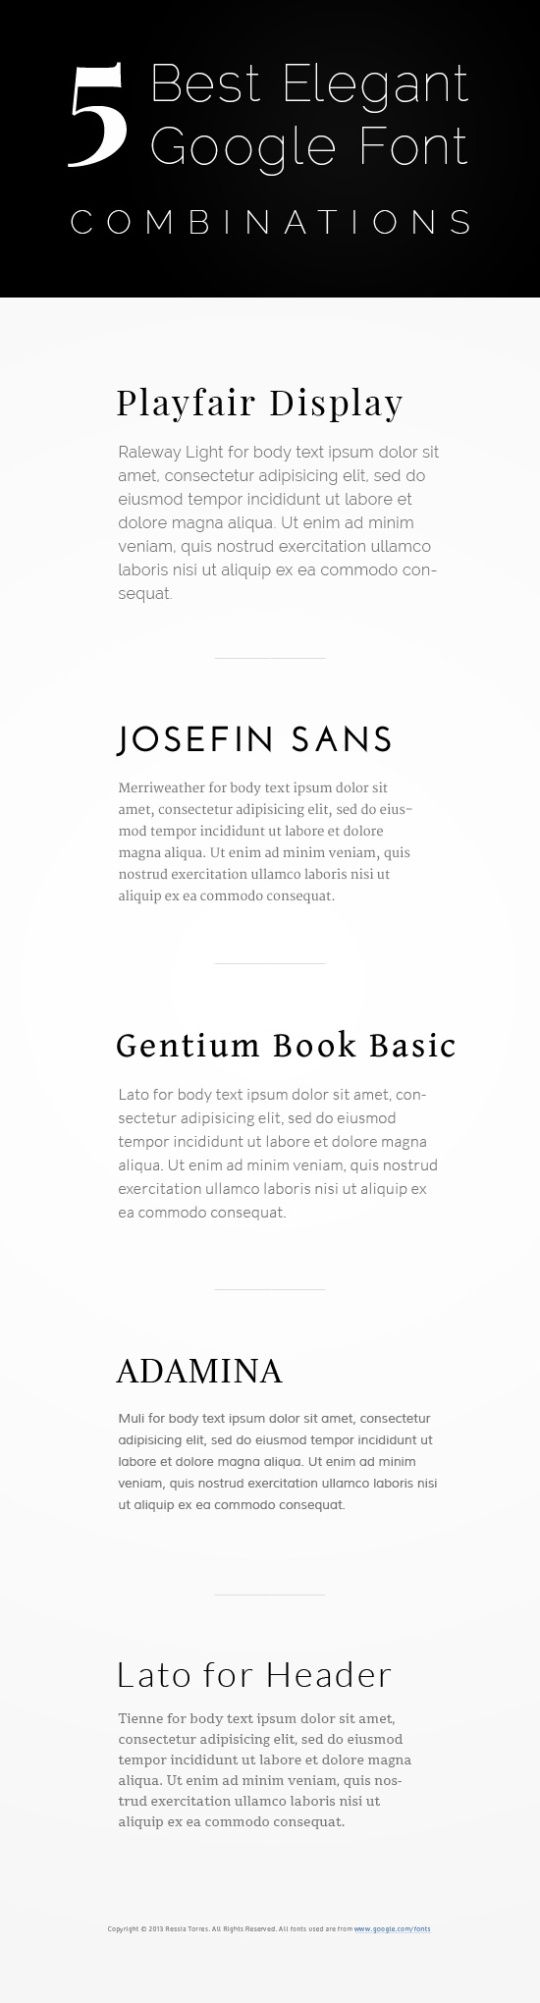 basic gentium fonts book google